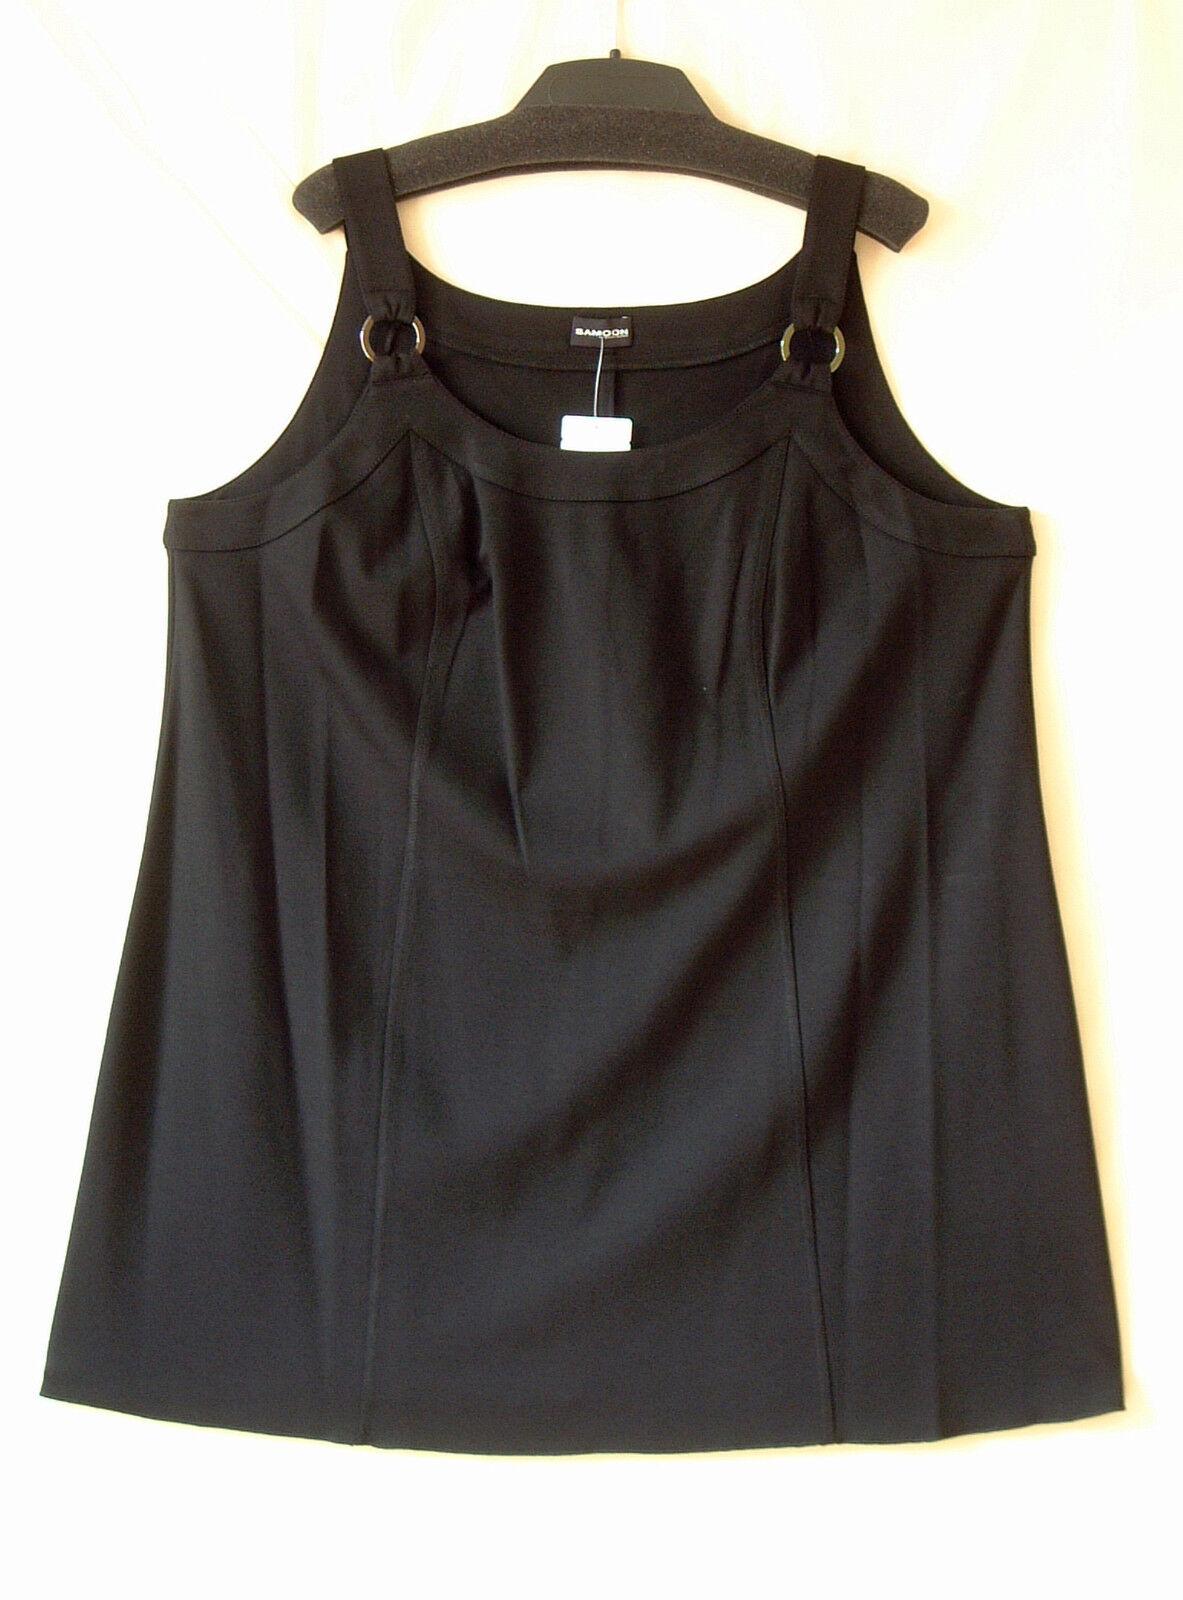 Samoon Top Kurz Kleid by Gerry Weber schwarz Stretch ViskoseMix Neu Damen Gr.54